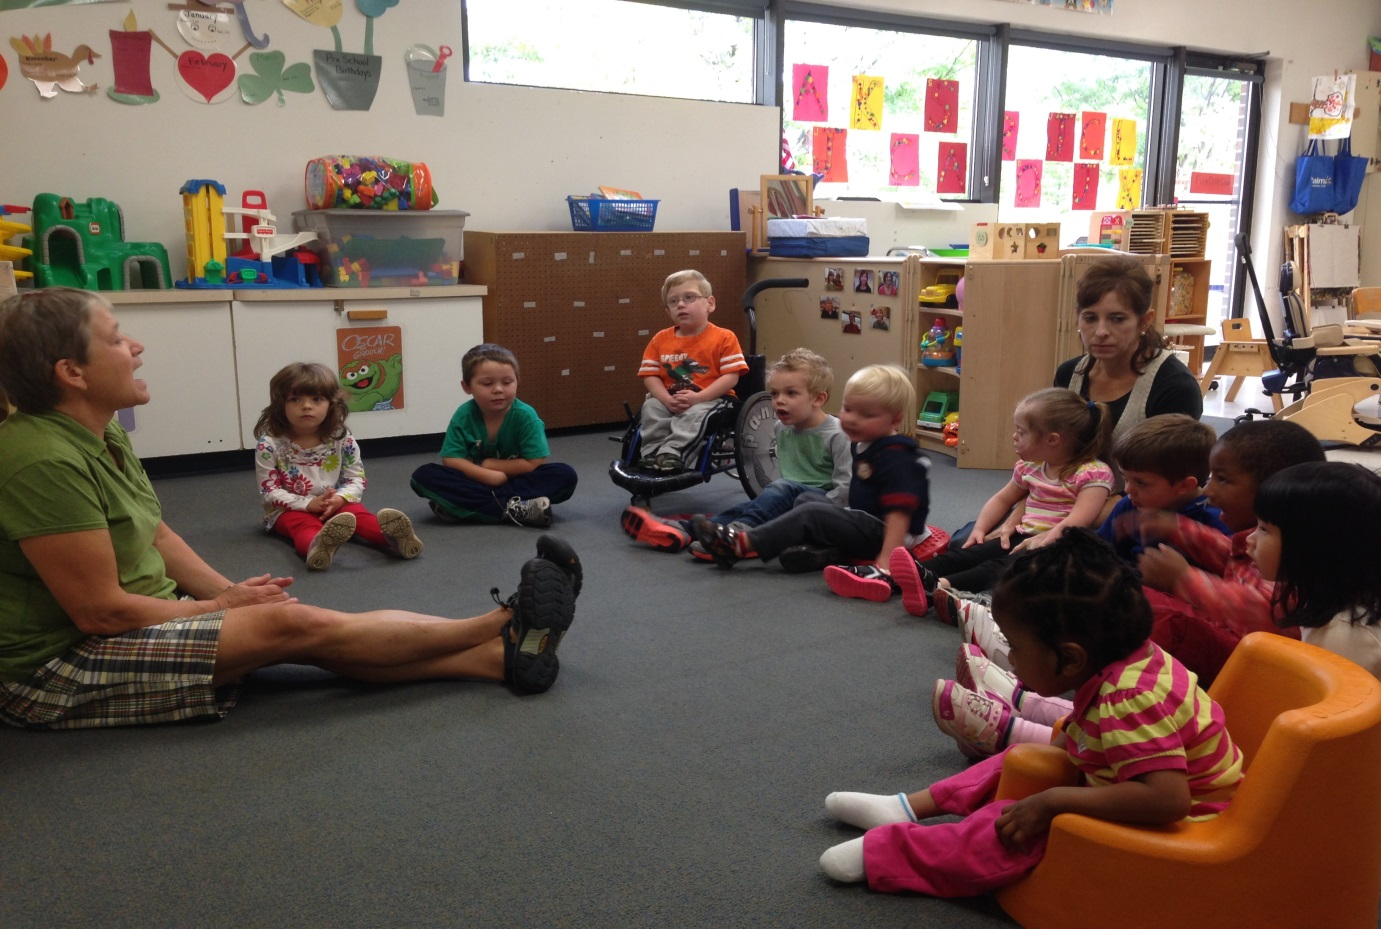 A Visit To Cp Rochester Augustin Children S Center Kids